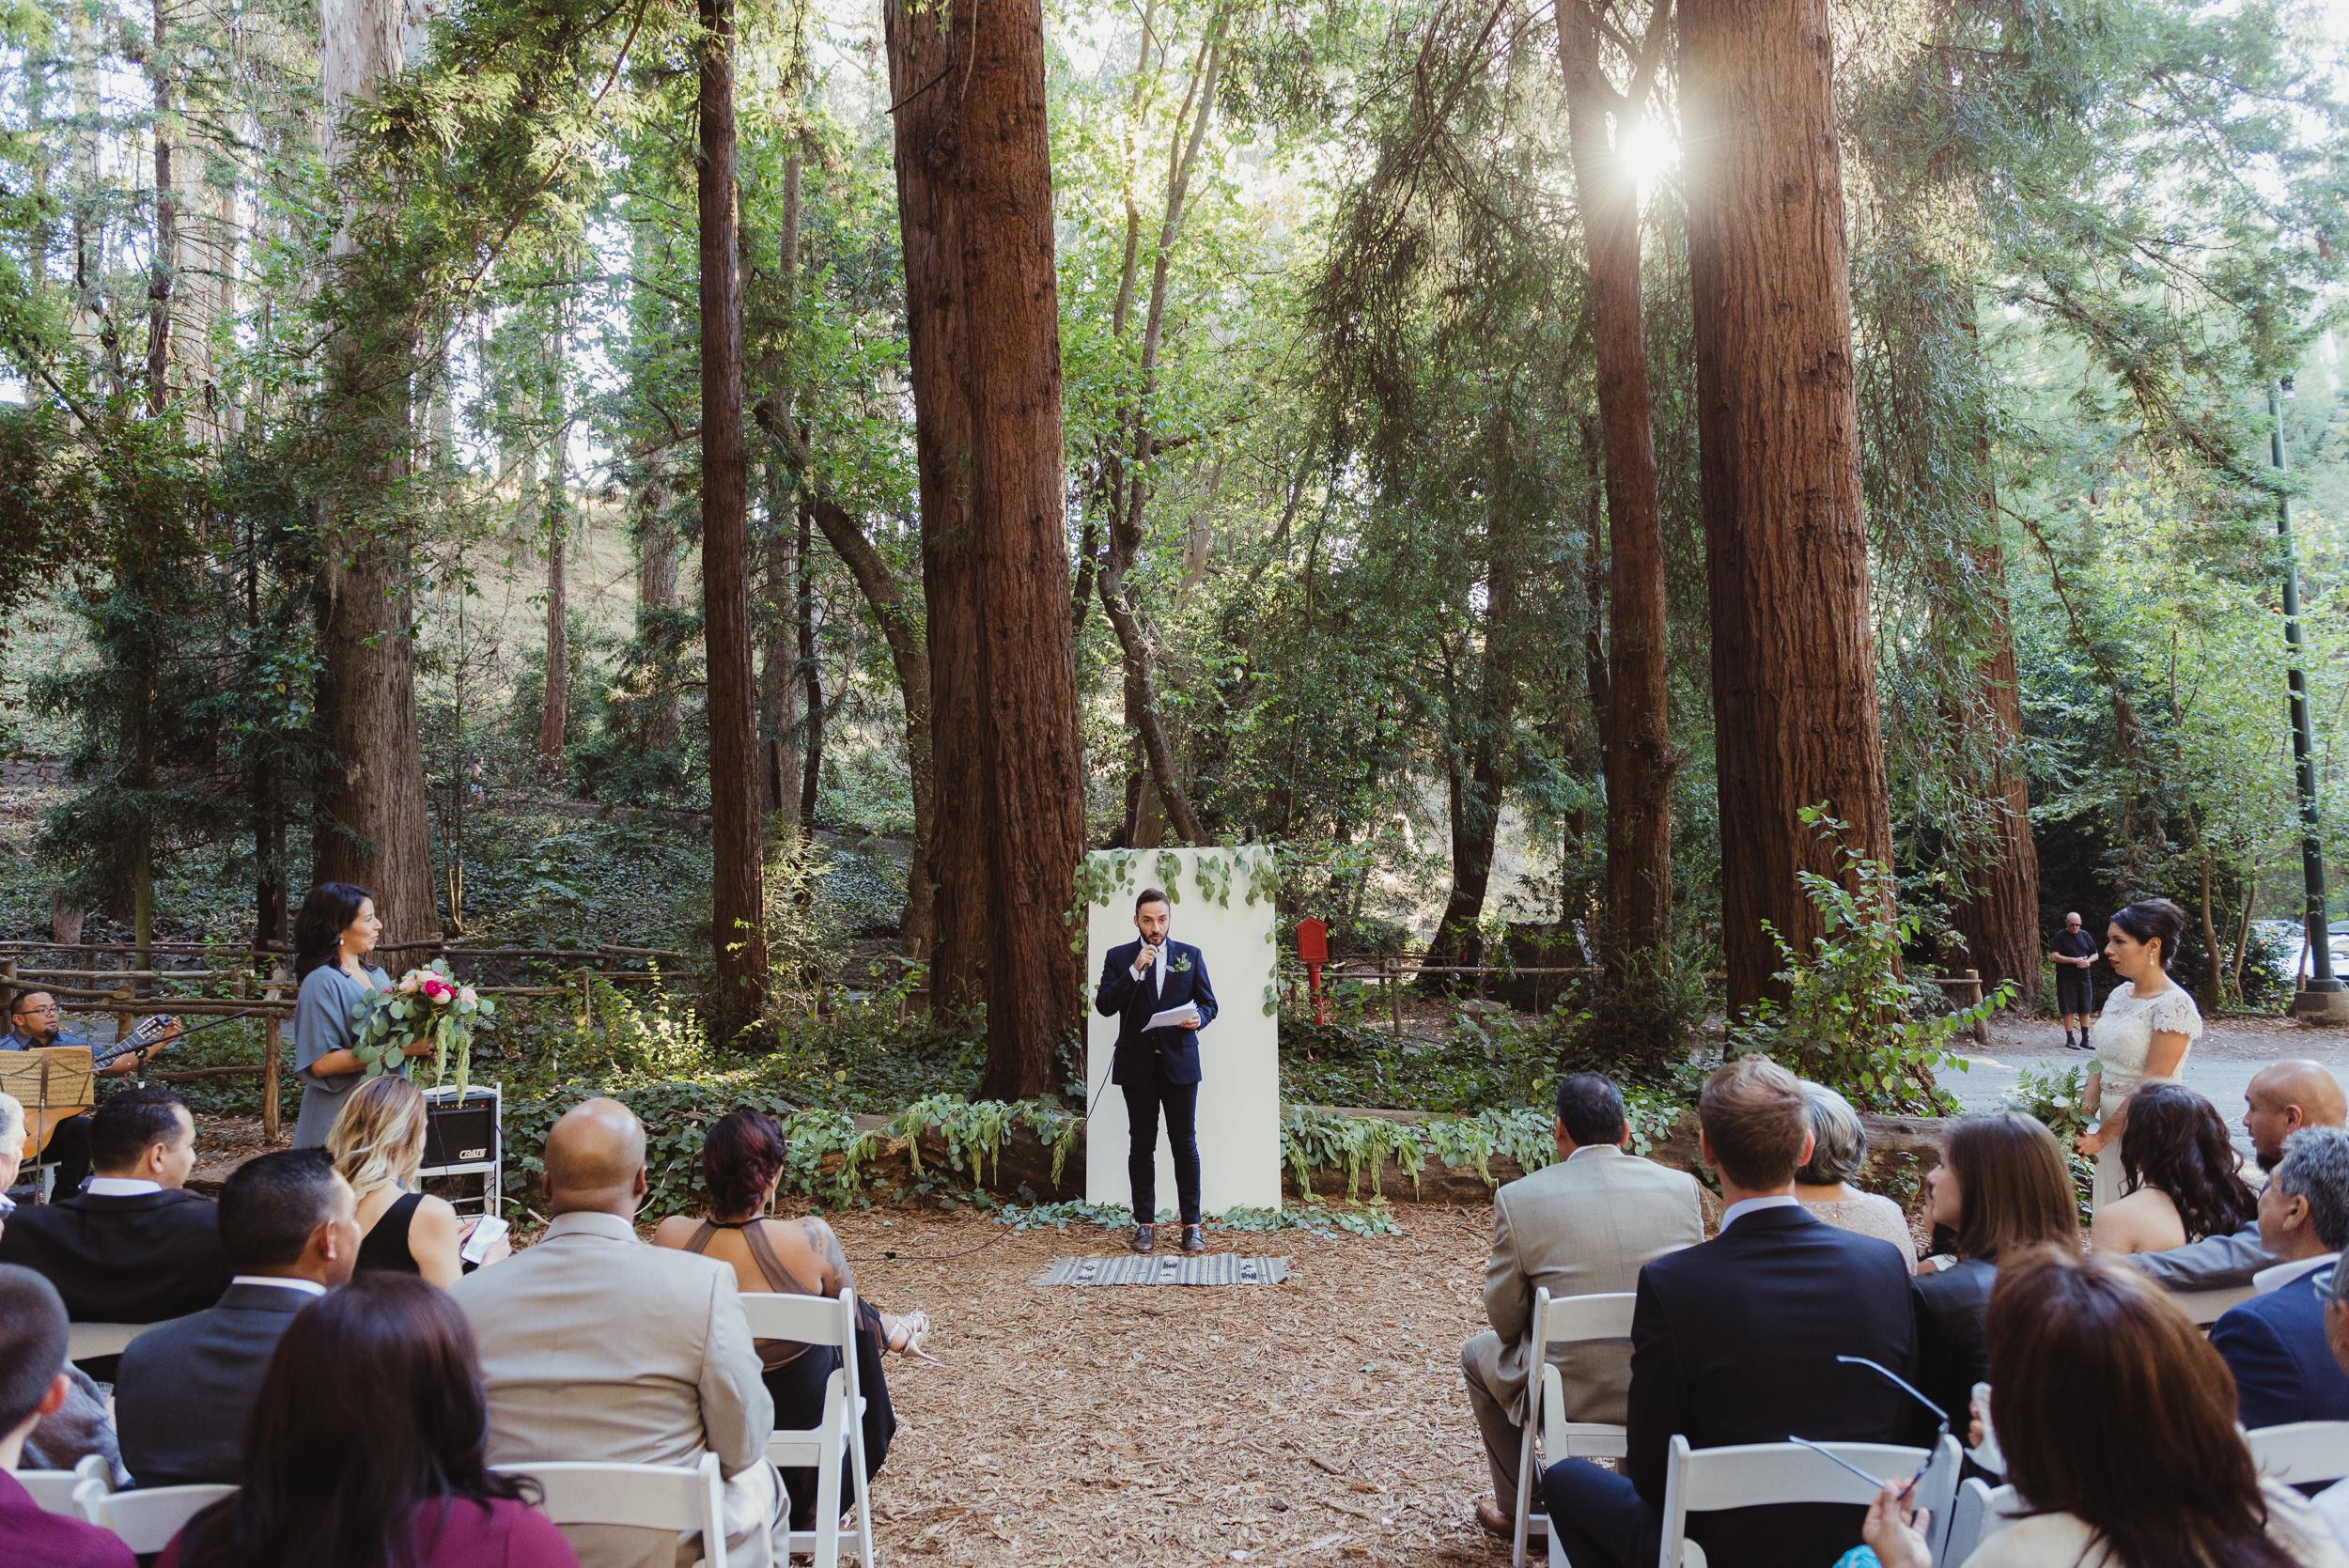 29san-francisco-stern-grove-wedding-photographer-vivianchen-209.jpg